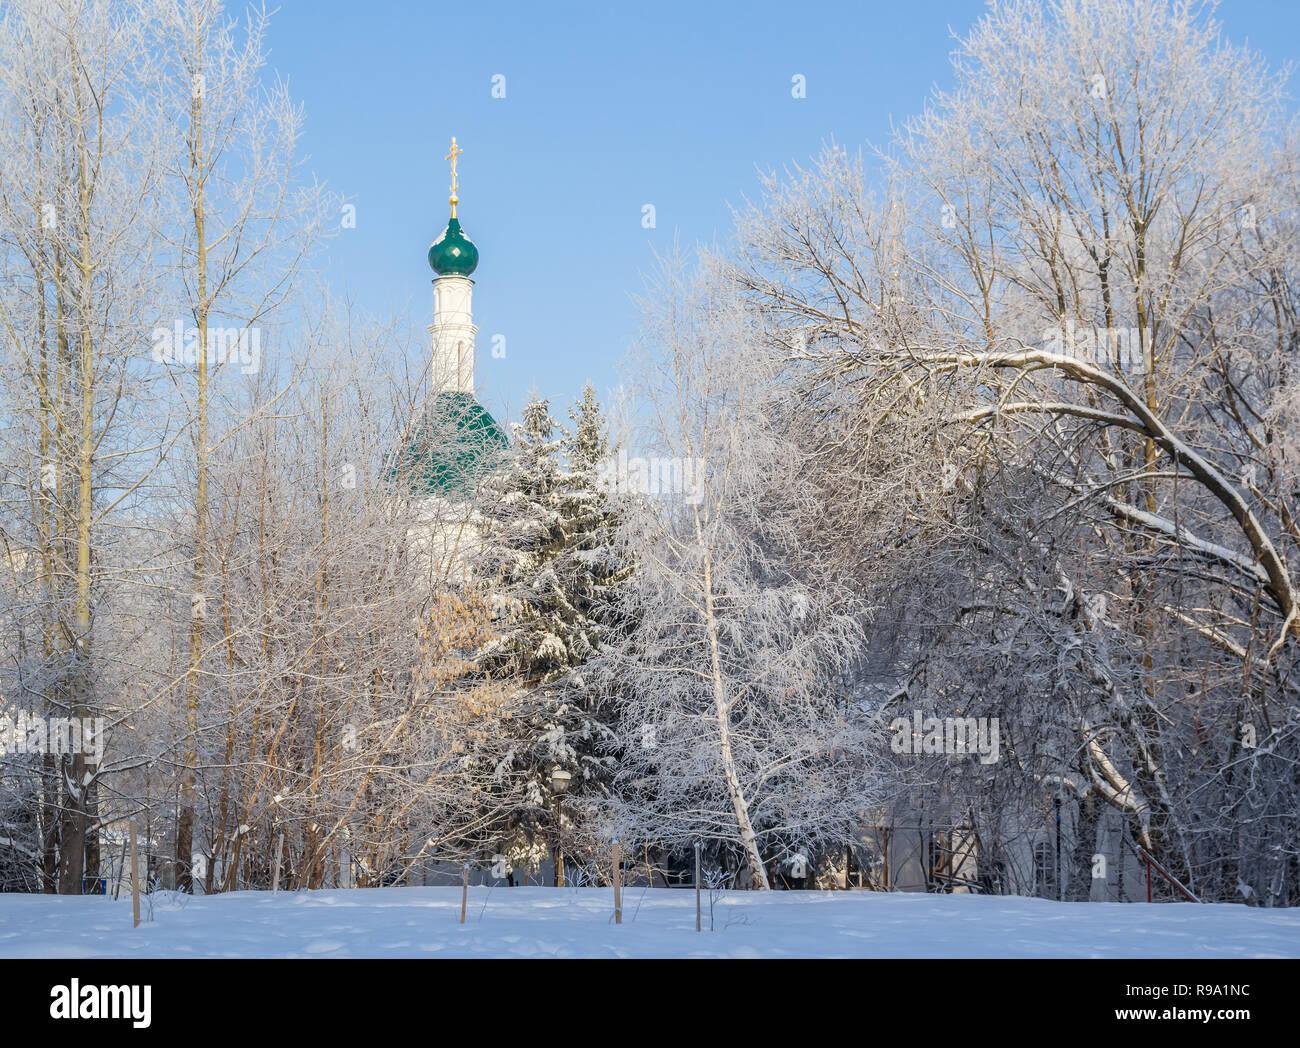 Peter and Paul Church in Kulibin Park in Nizhny Novgorod, Russia - Stock Image